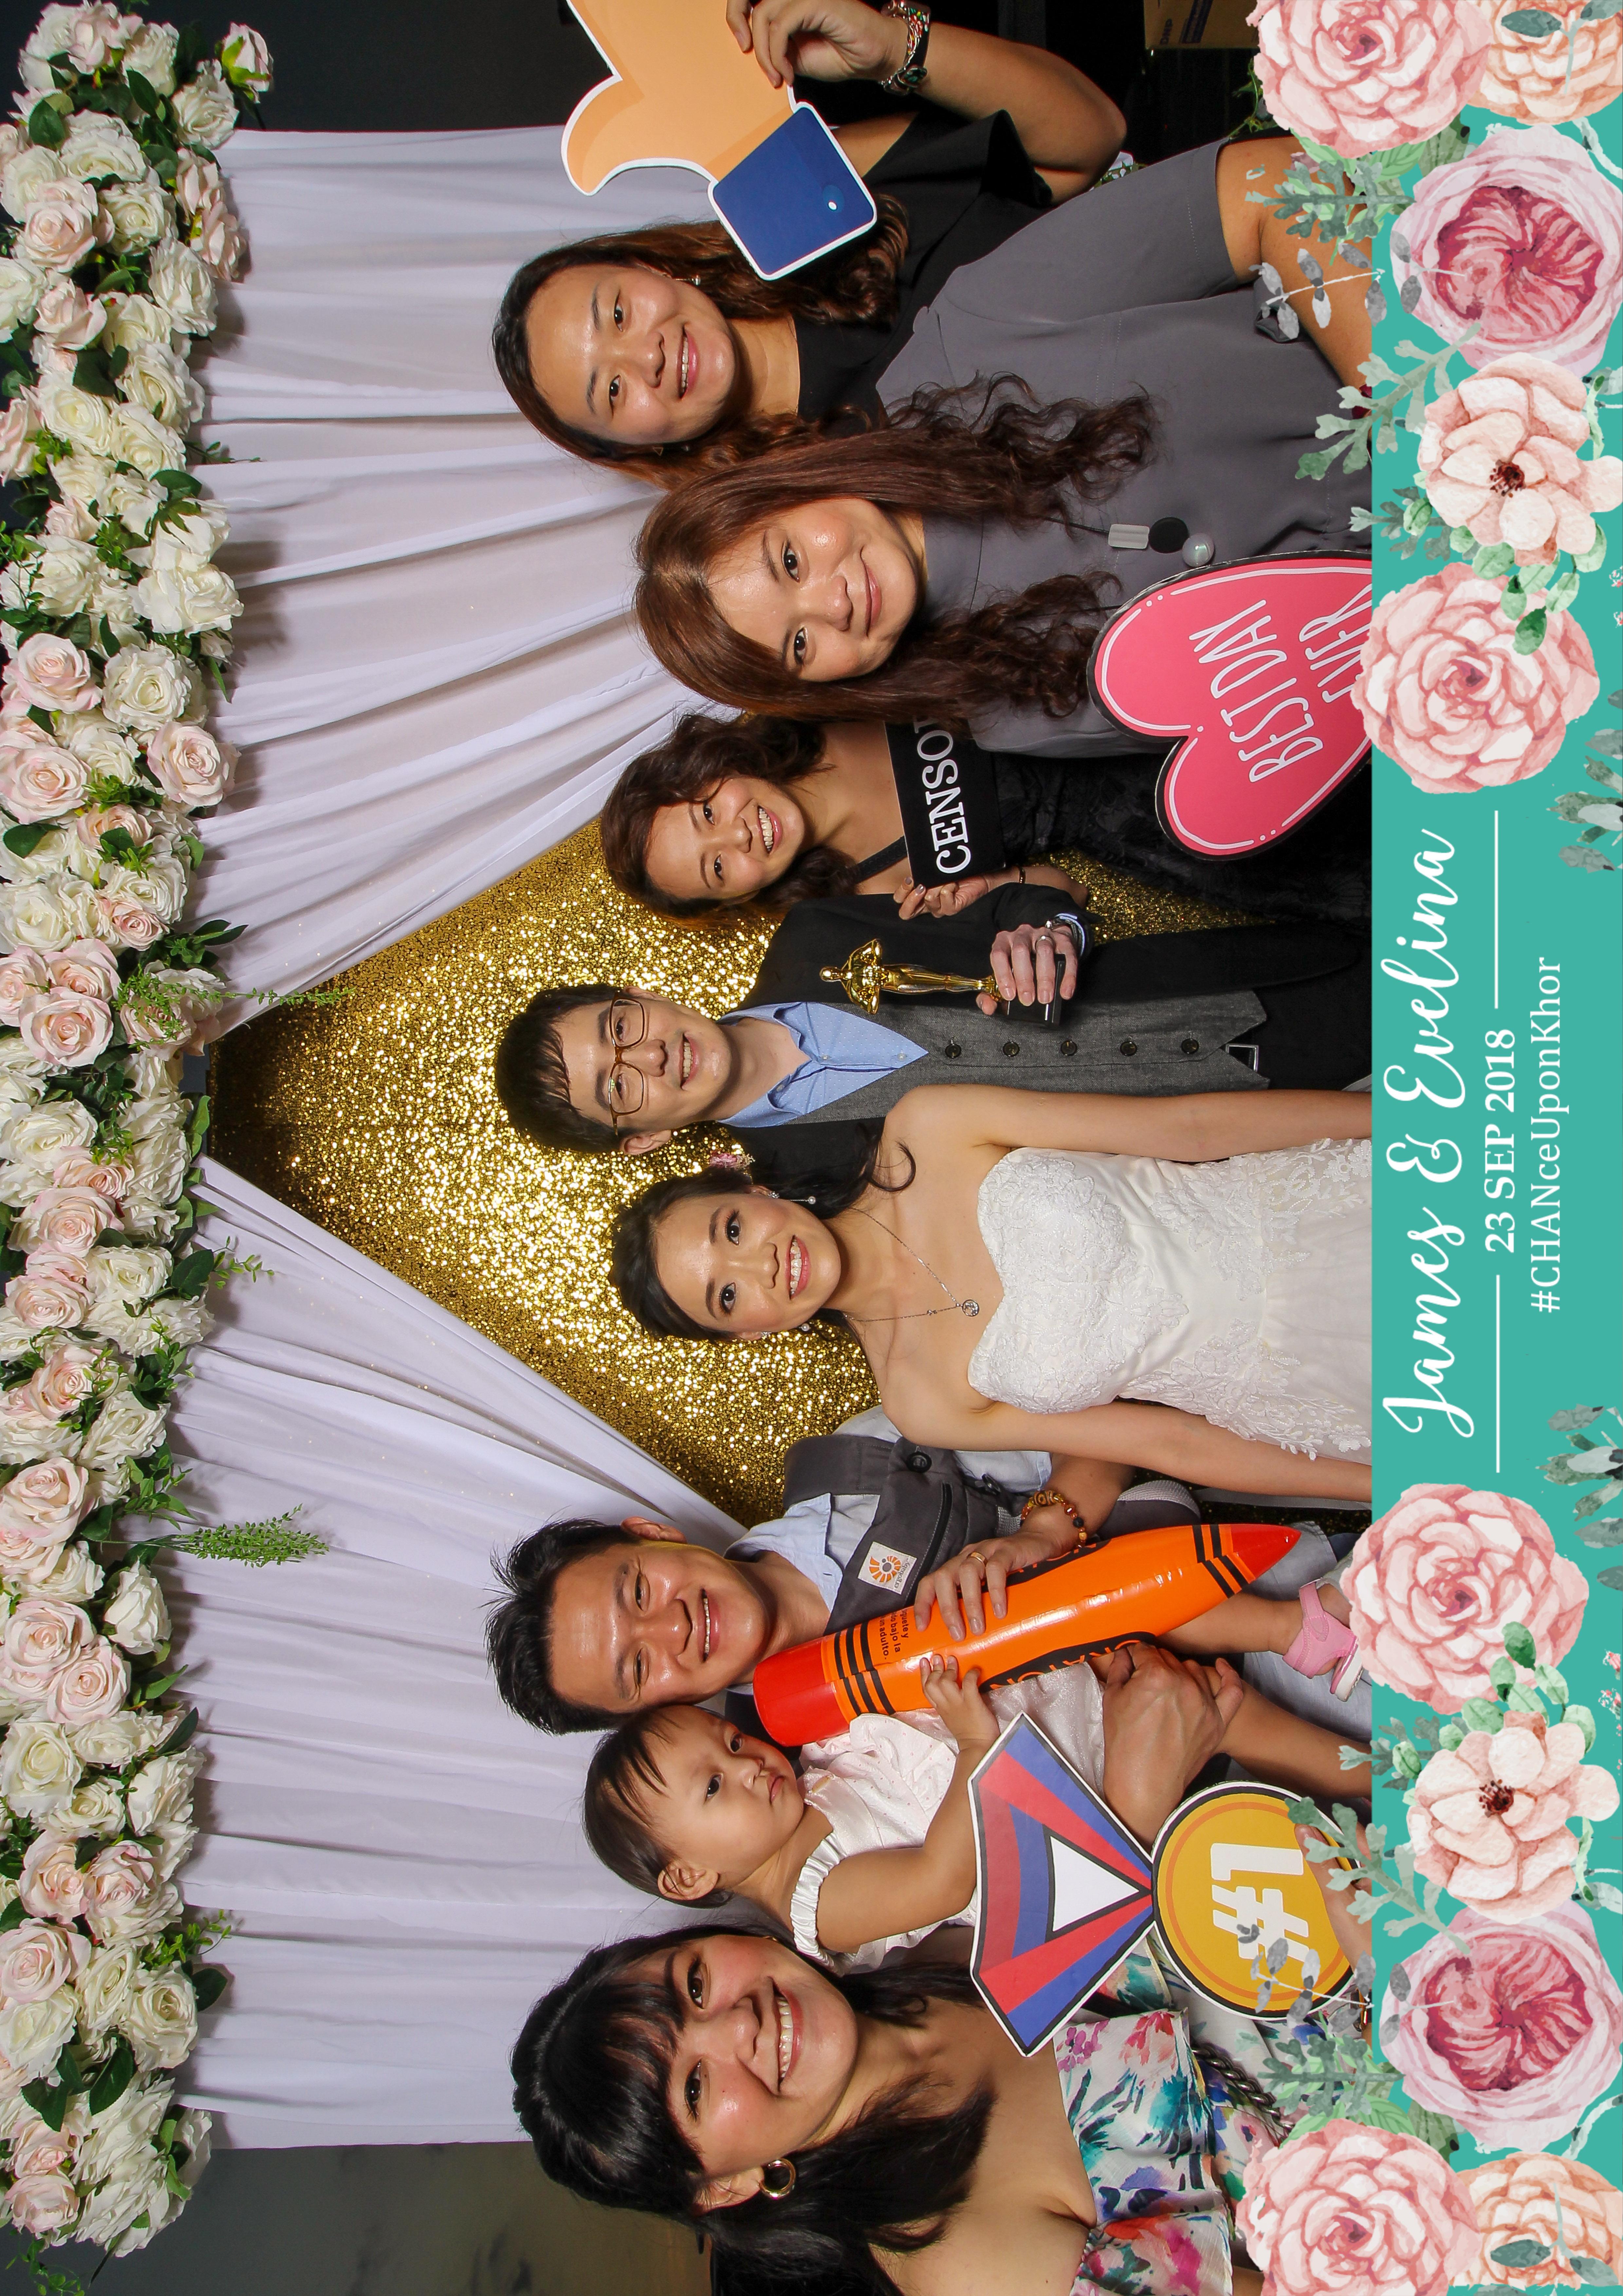 wedding photo booth singapore-30